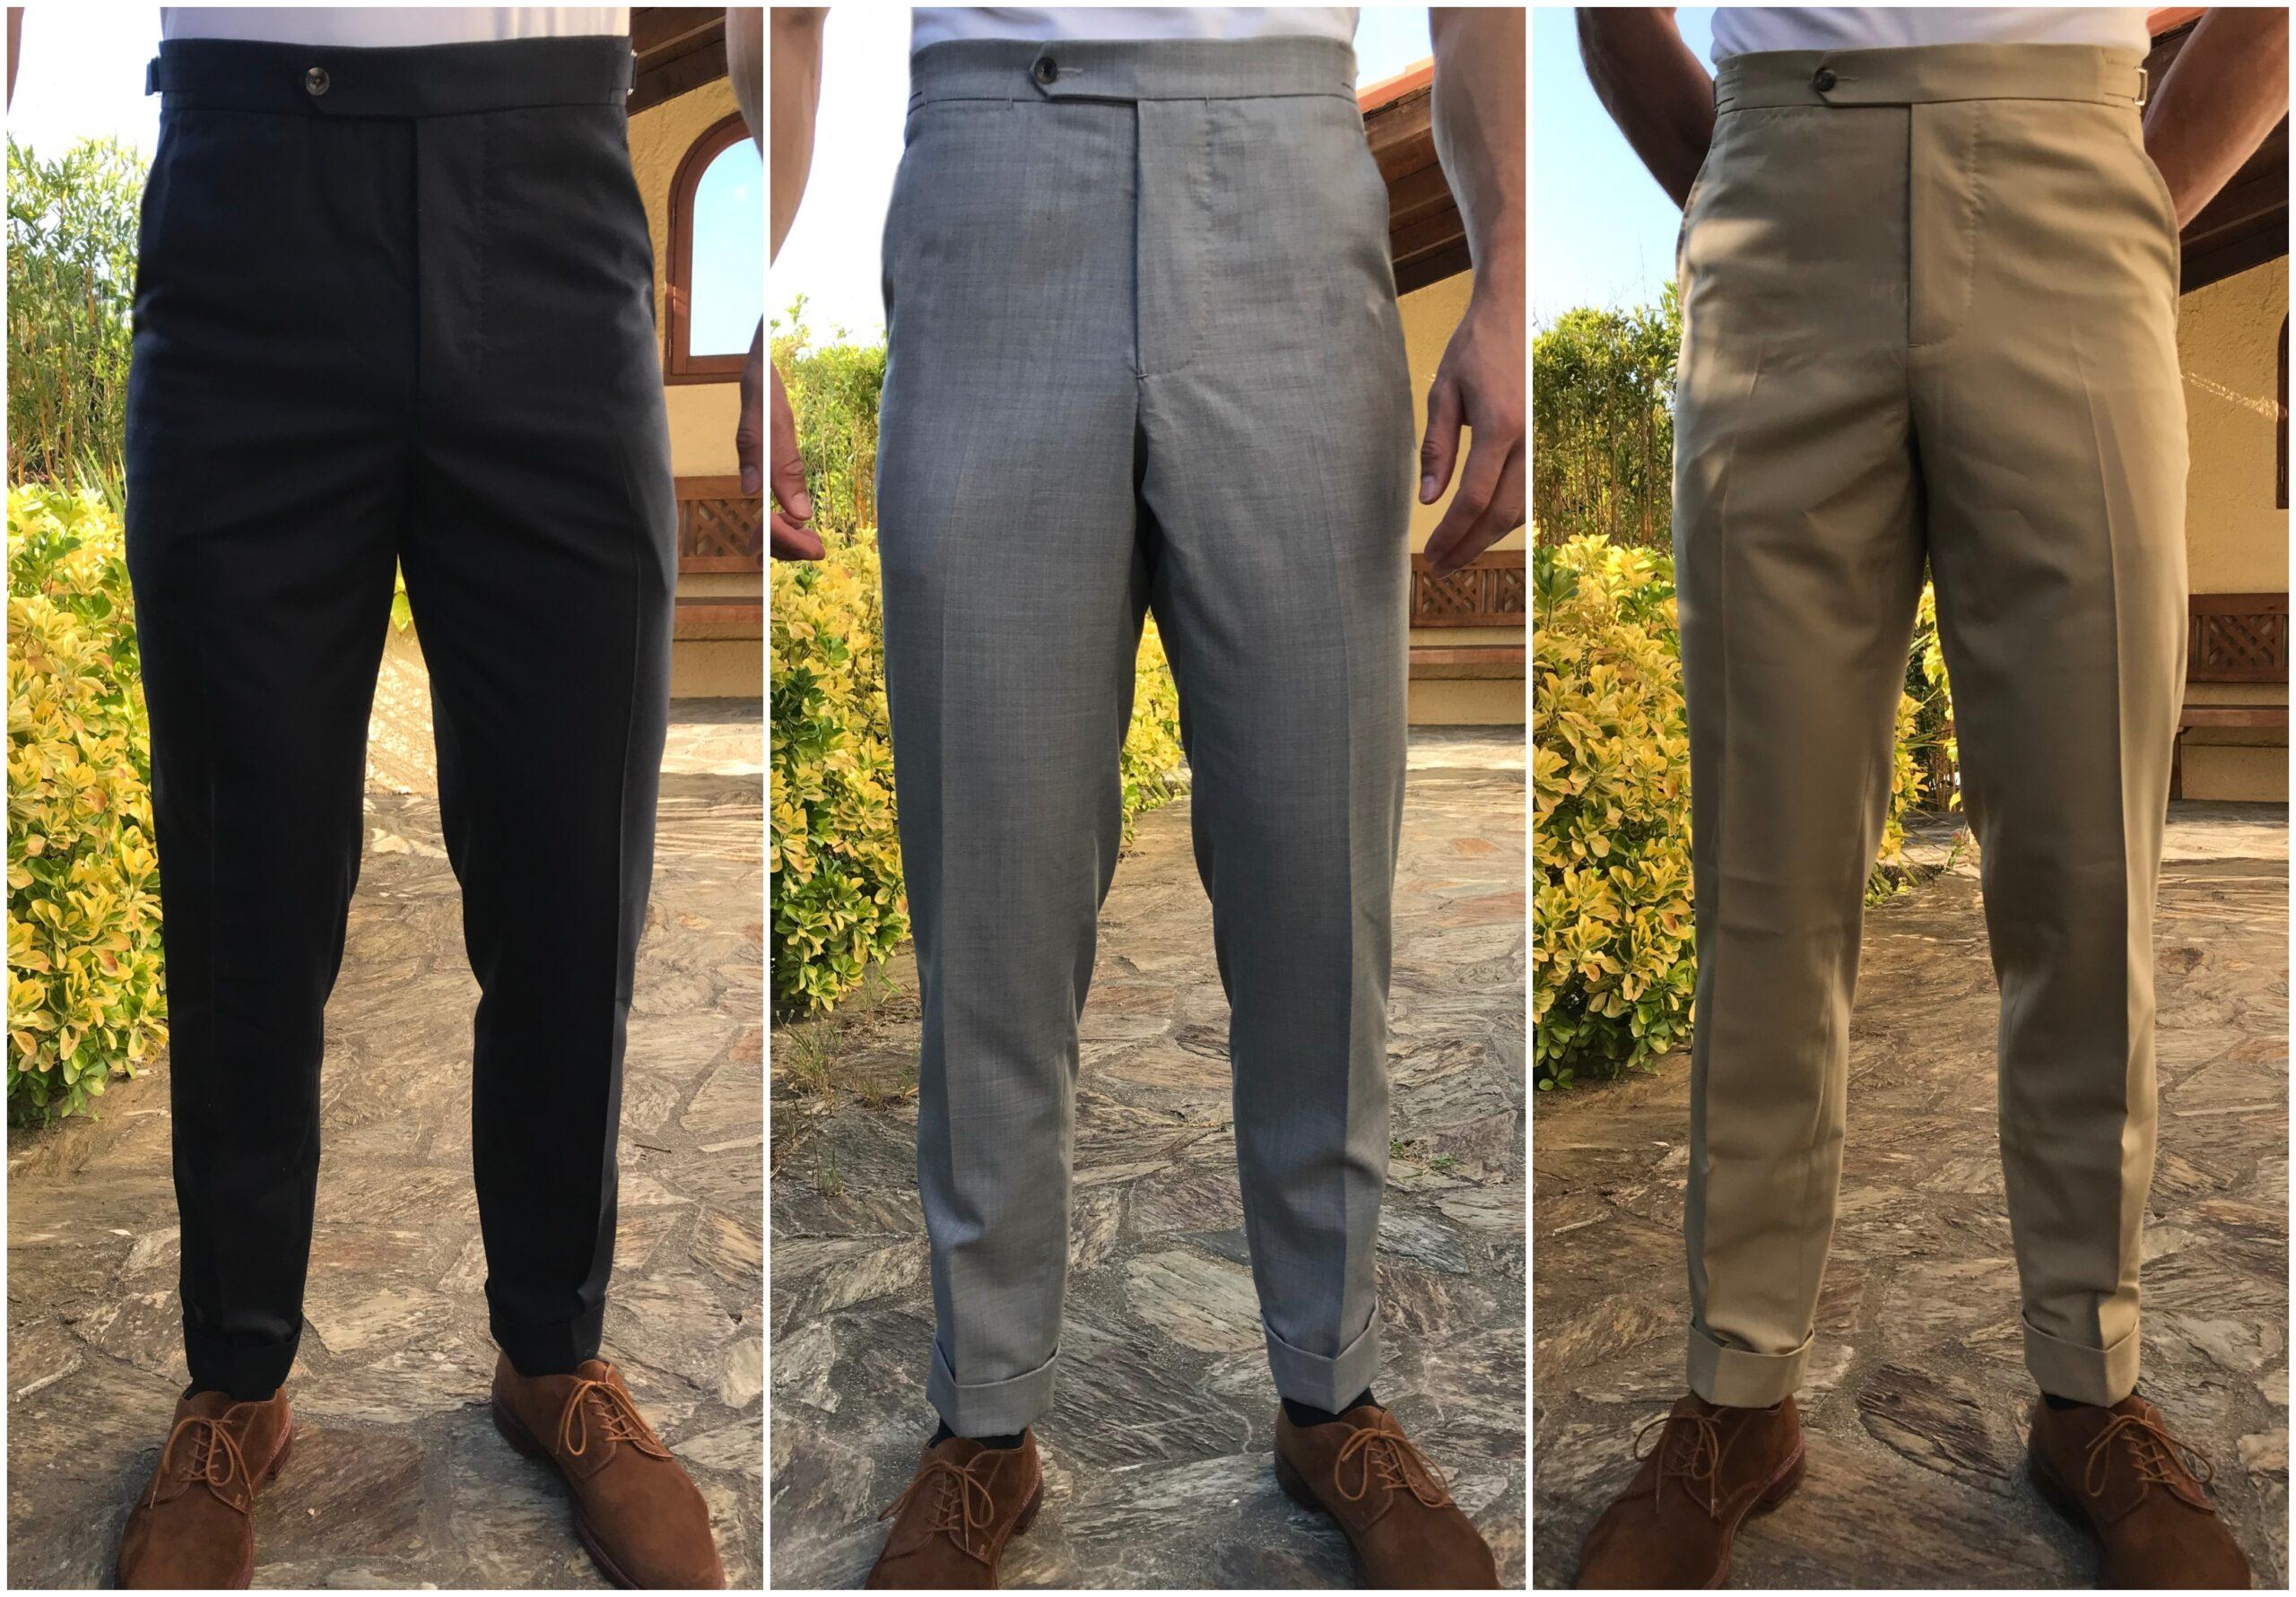 Pantalons Luxire (tissu : washable wool), souliers Alden, T-shirt blanc Domyos.